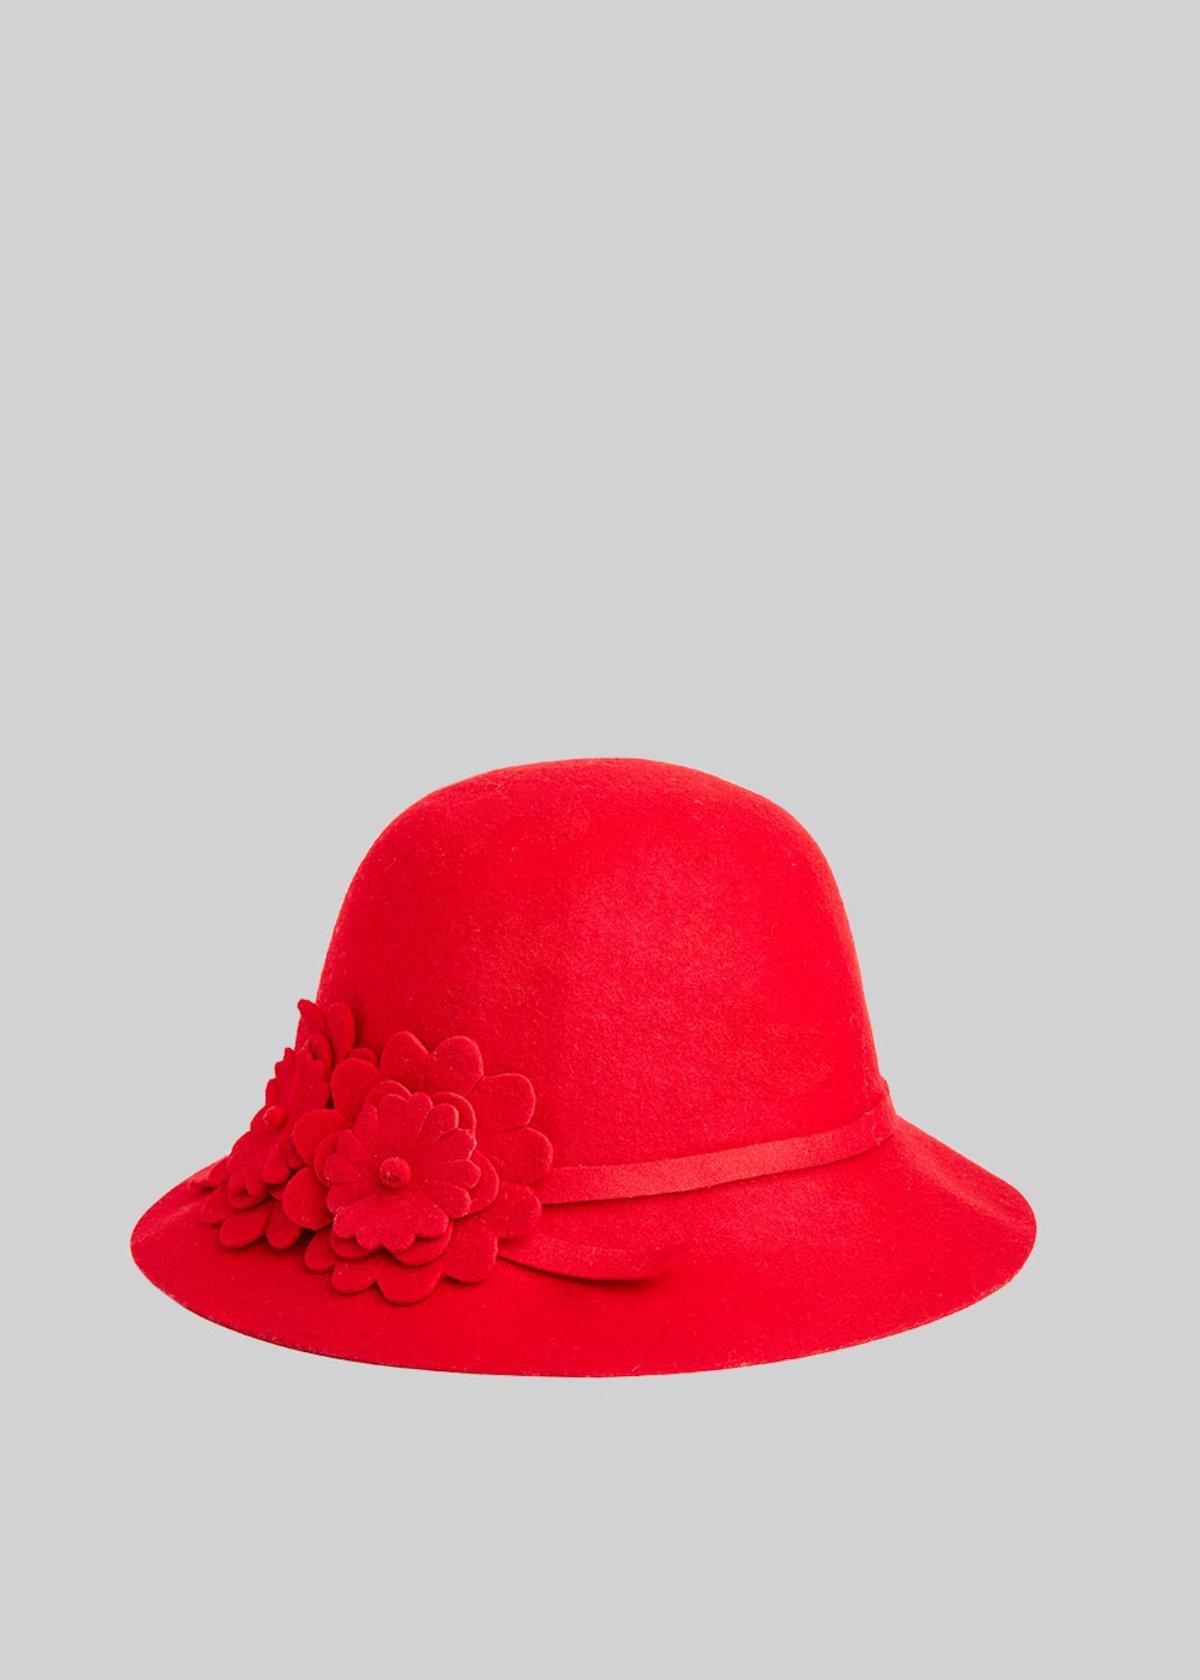 Cappello Cyber in lana con dettaglio flower - Taurine - Donna - Immagine  categoria 2c07af7fb467